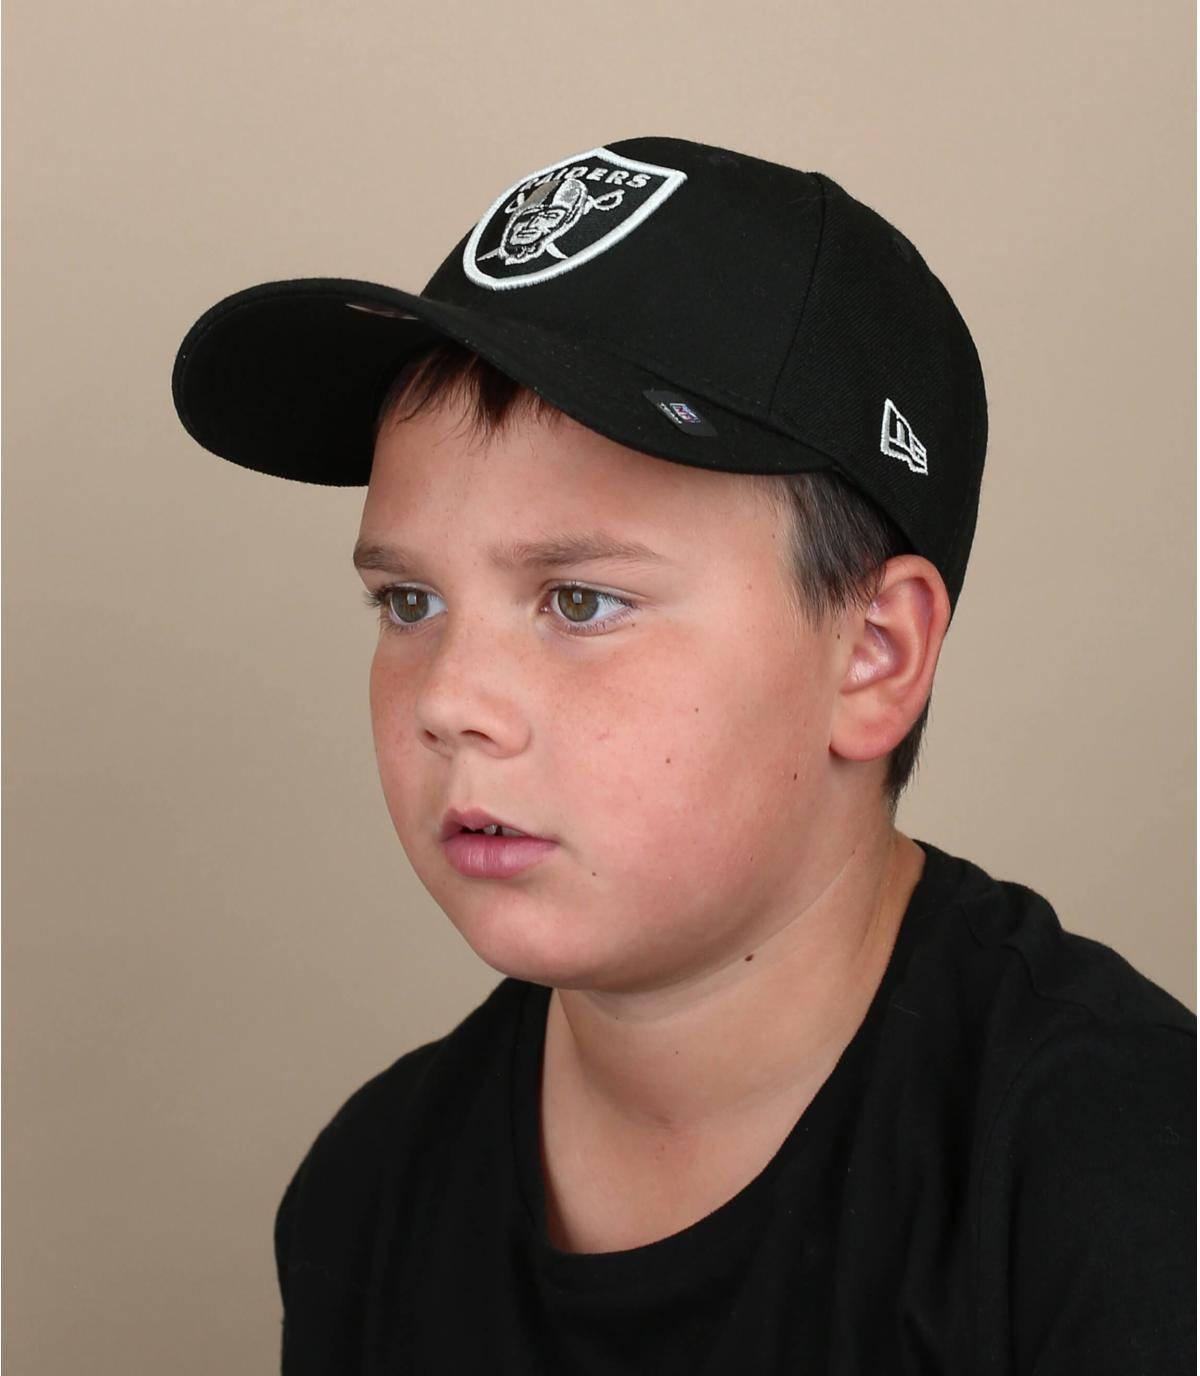 casquette Raiders enfant